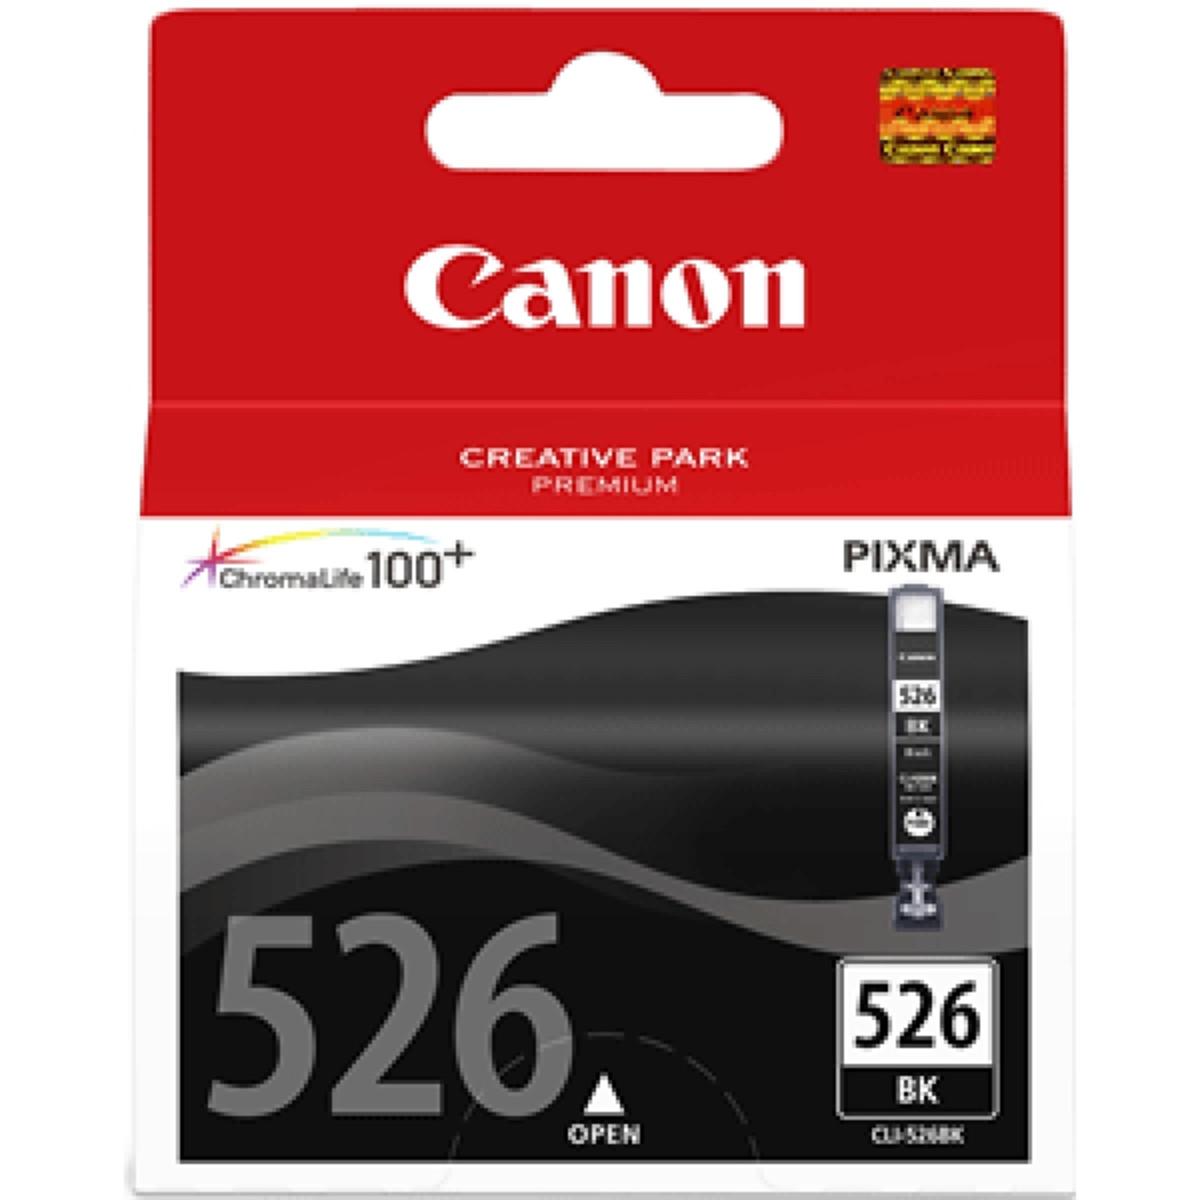 Canon CLI-526BK Photo Black Ink Cartridge